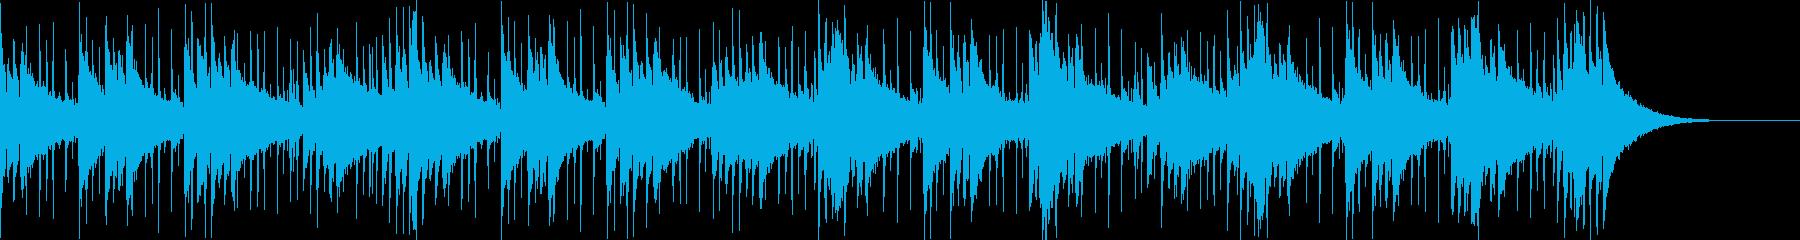 Pf「報道」和風現代ジャズの再生済みの波形